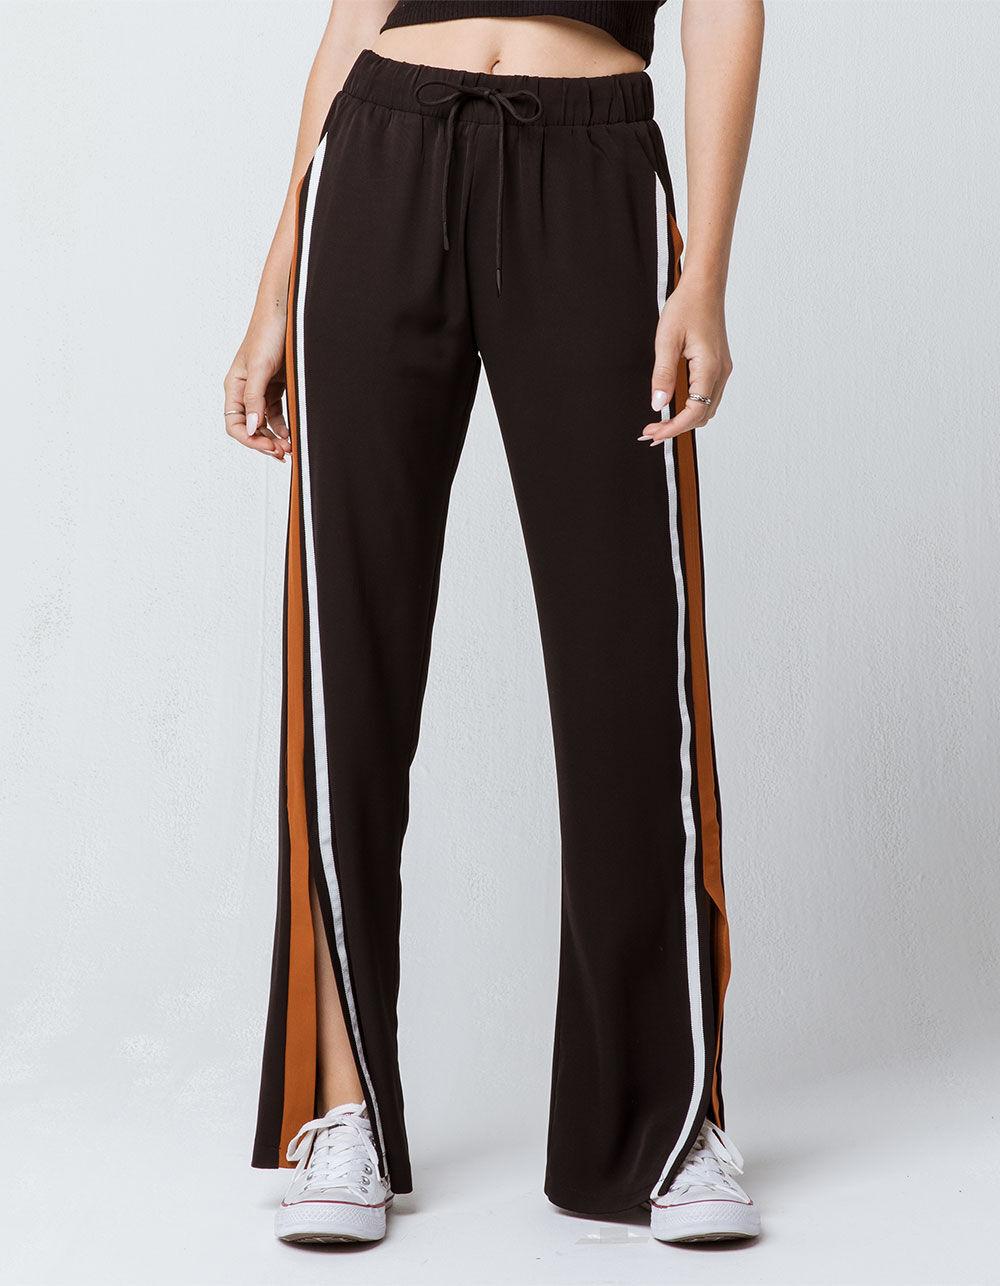 SKY AND SPARROW Side Stripe Wide Leg Pants